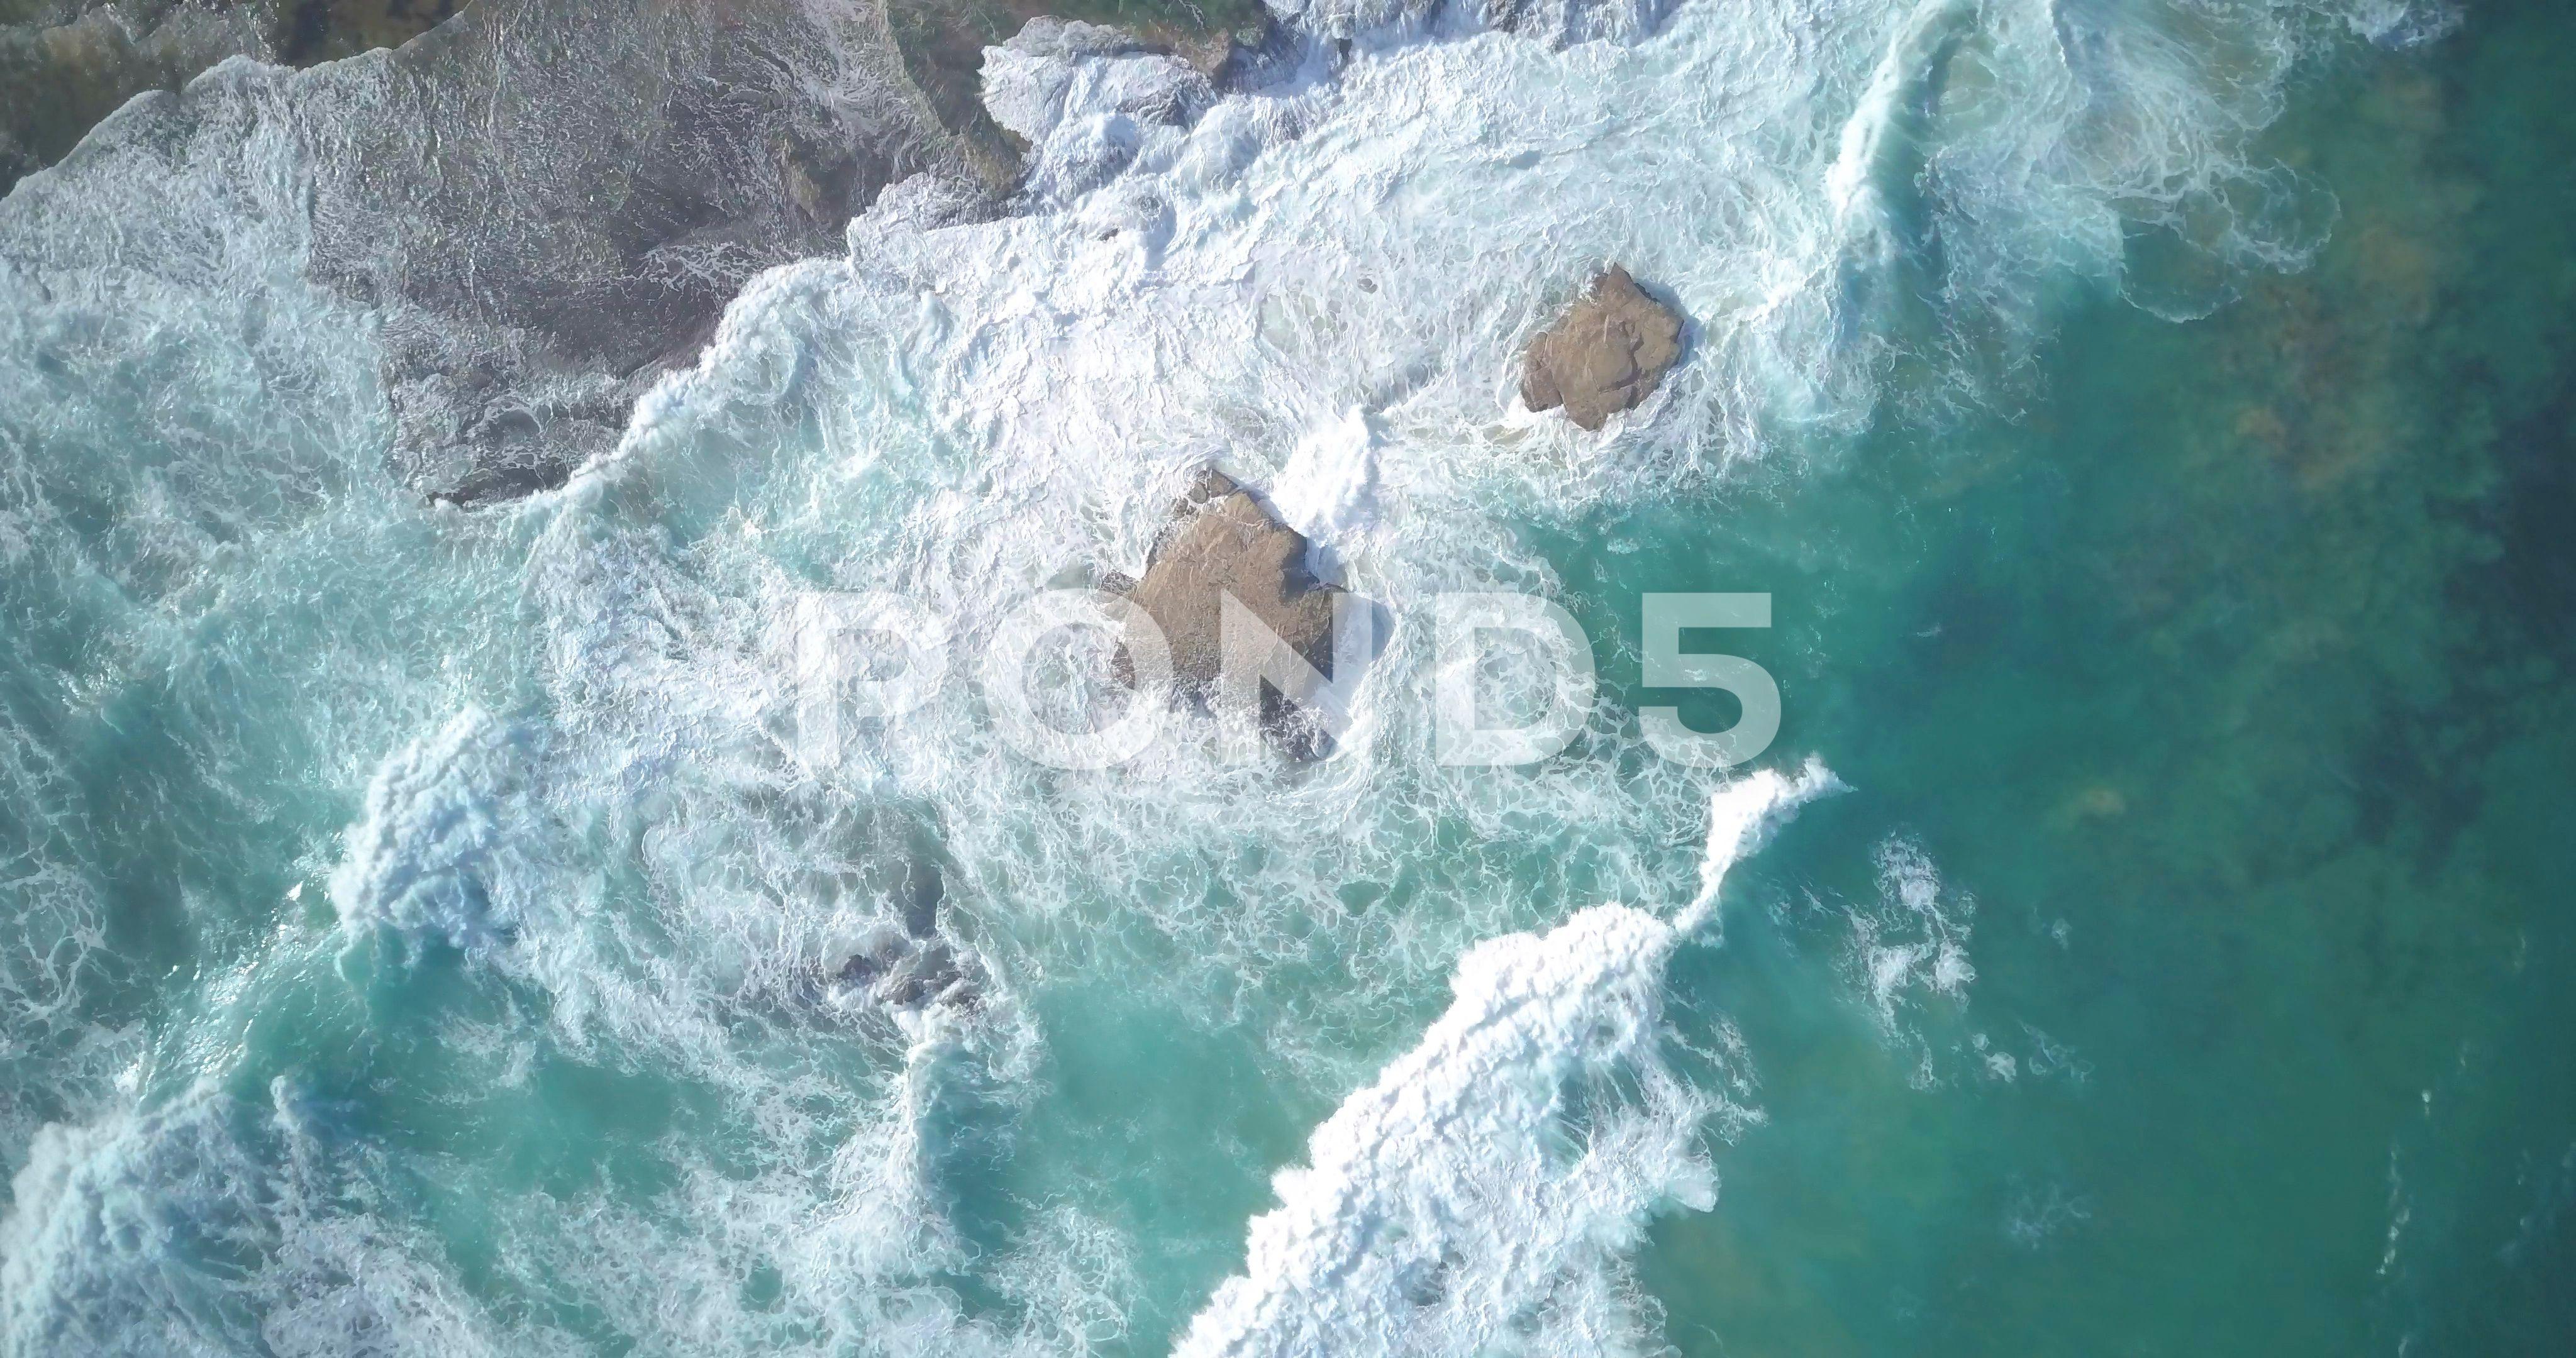 Drone View Of Waves Splashing On Rocks In Sea Ad Waves Splashing Drone View Sea Waves Aerial Aerial View